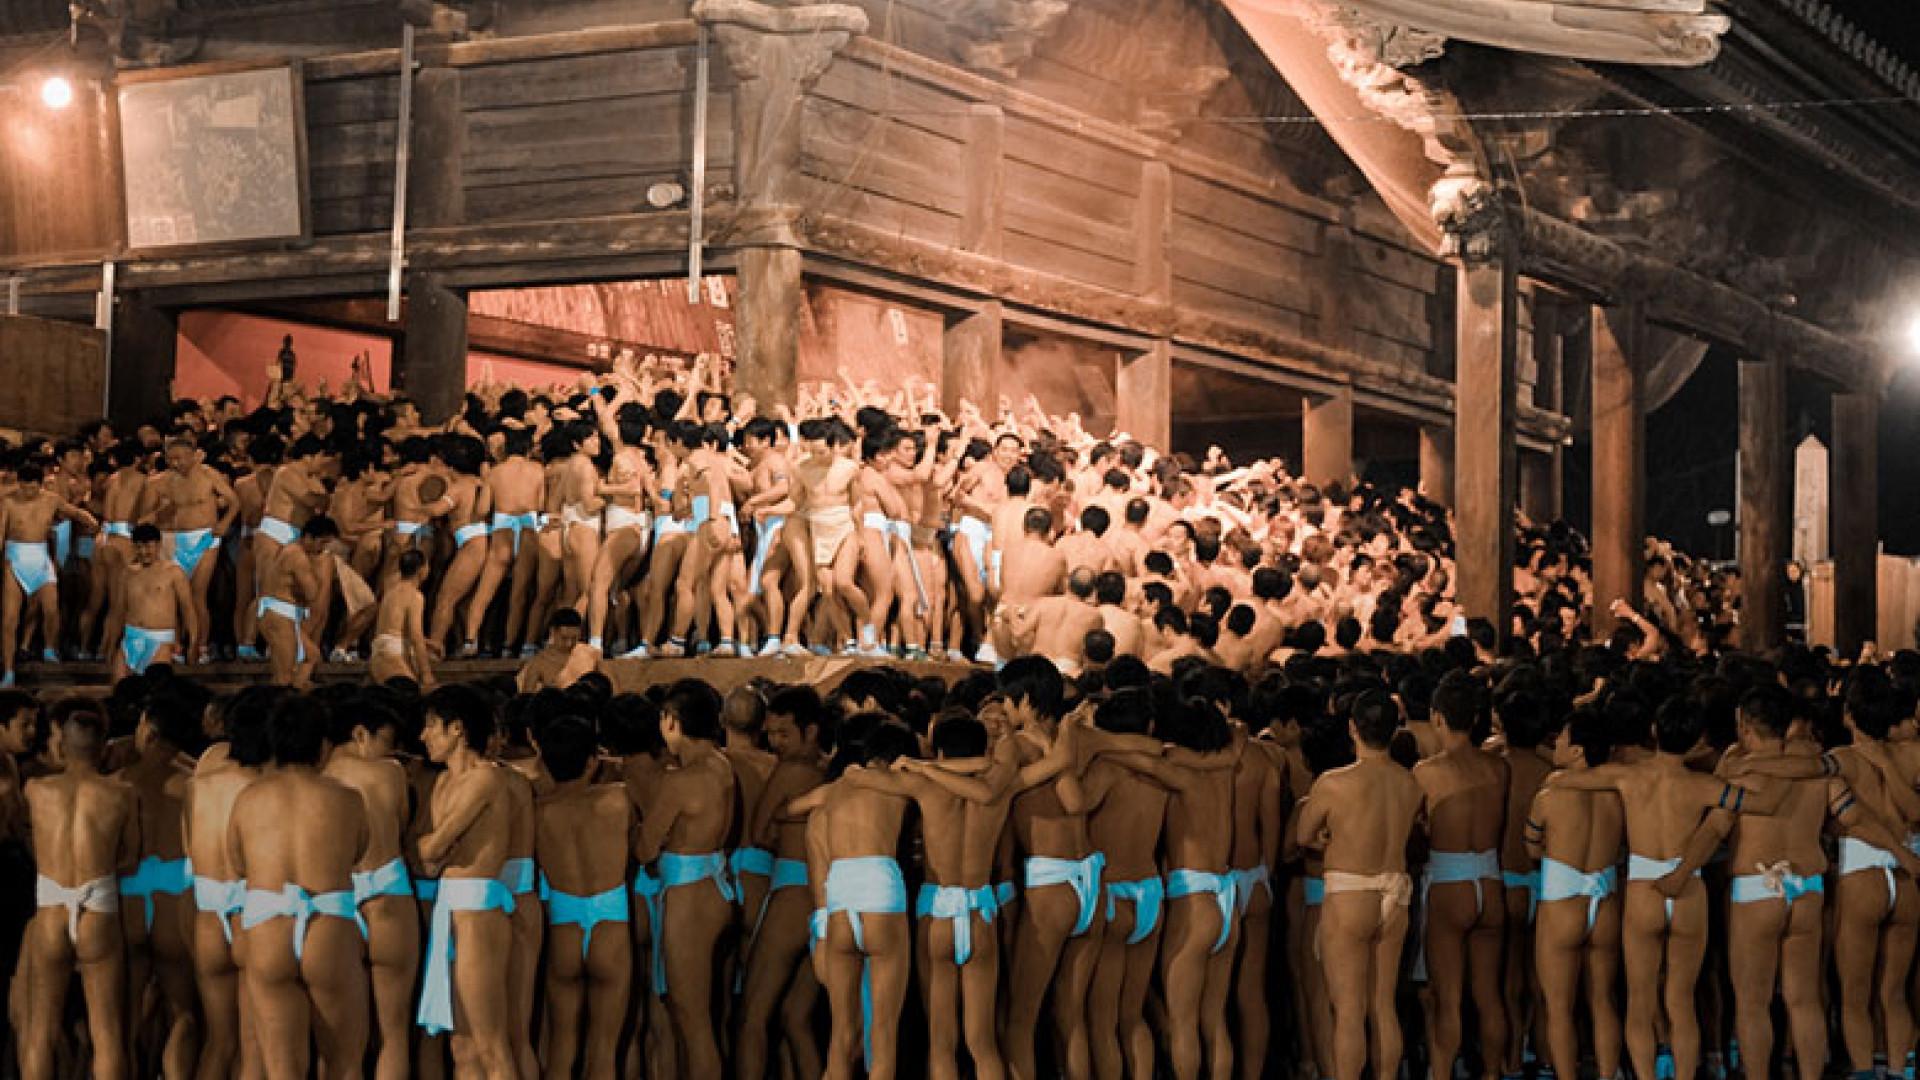 Nude festival hentay vids